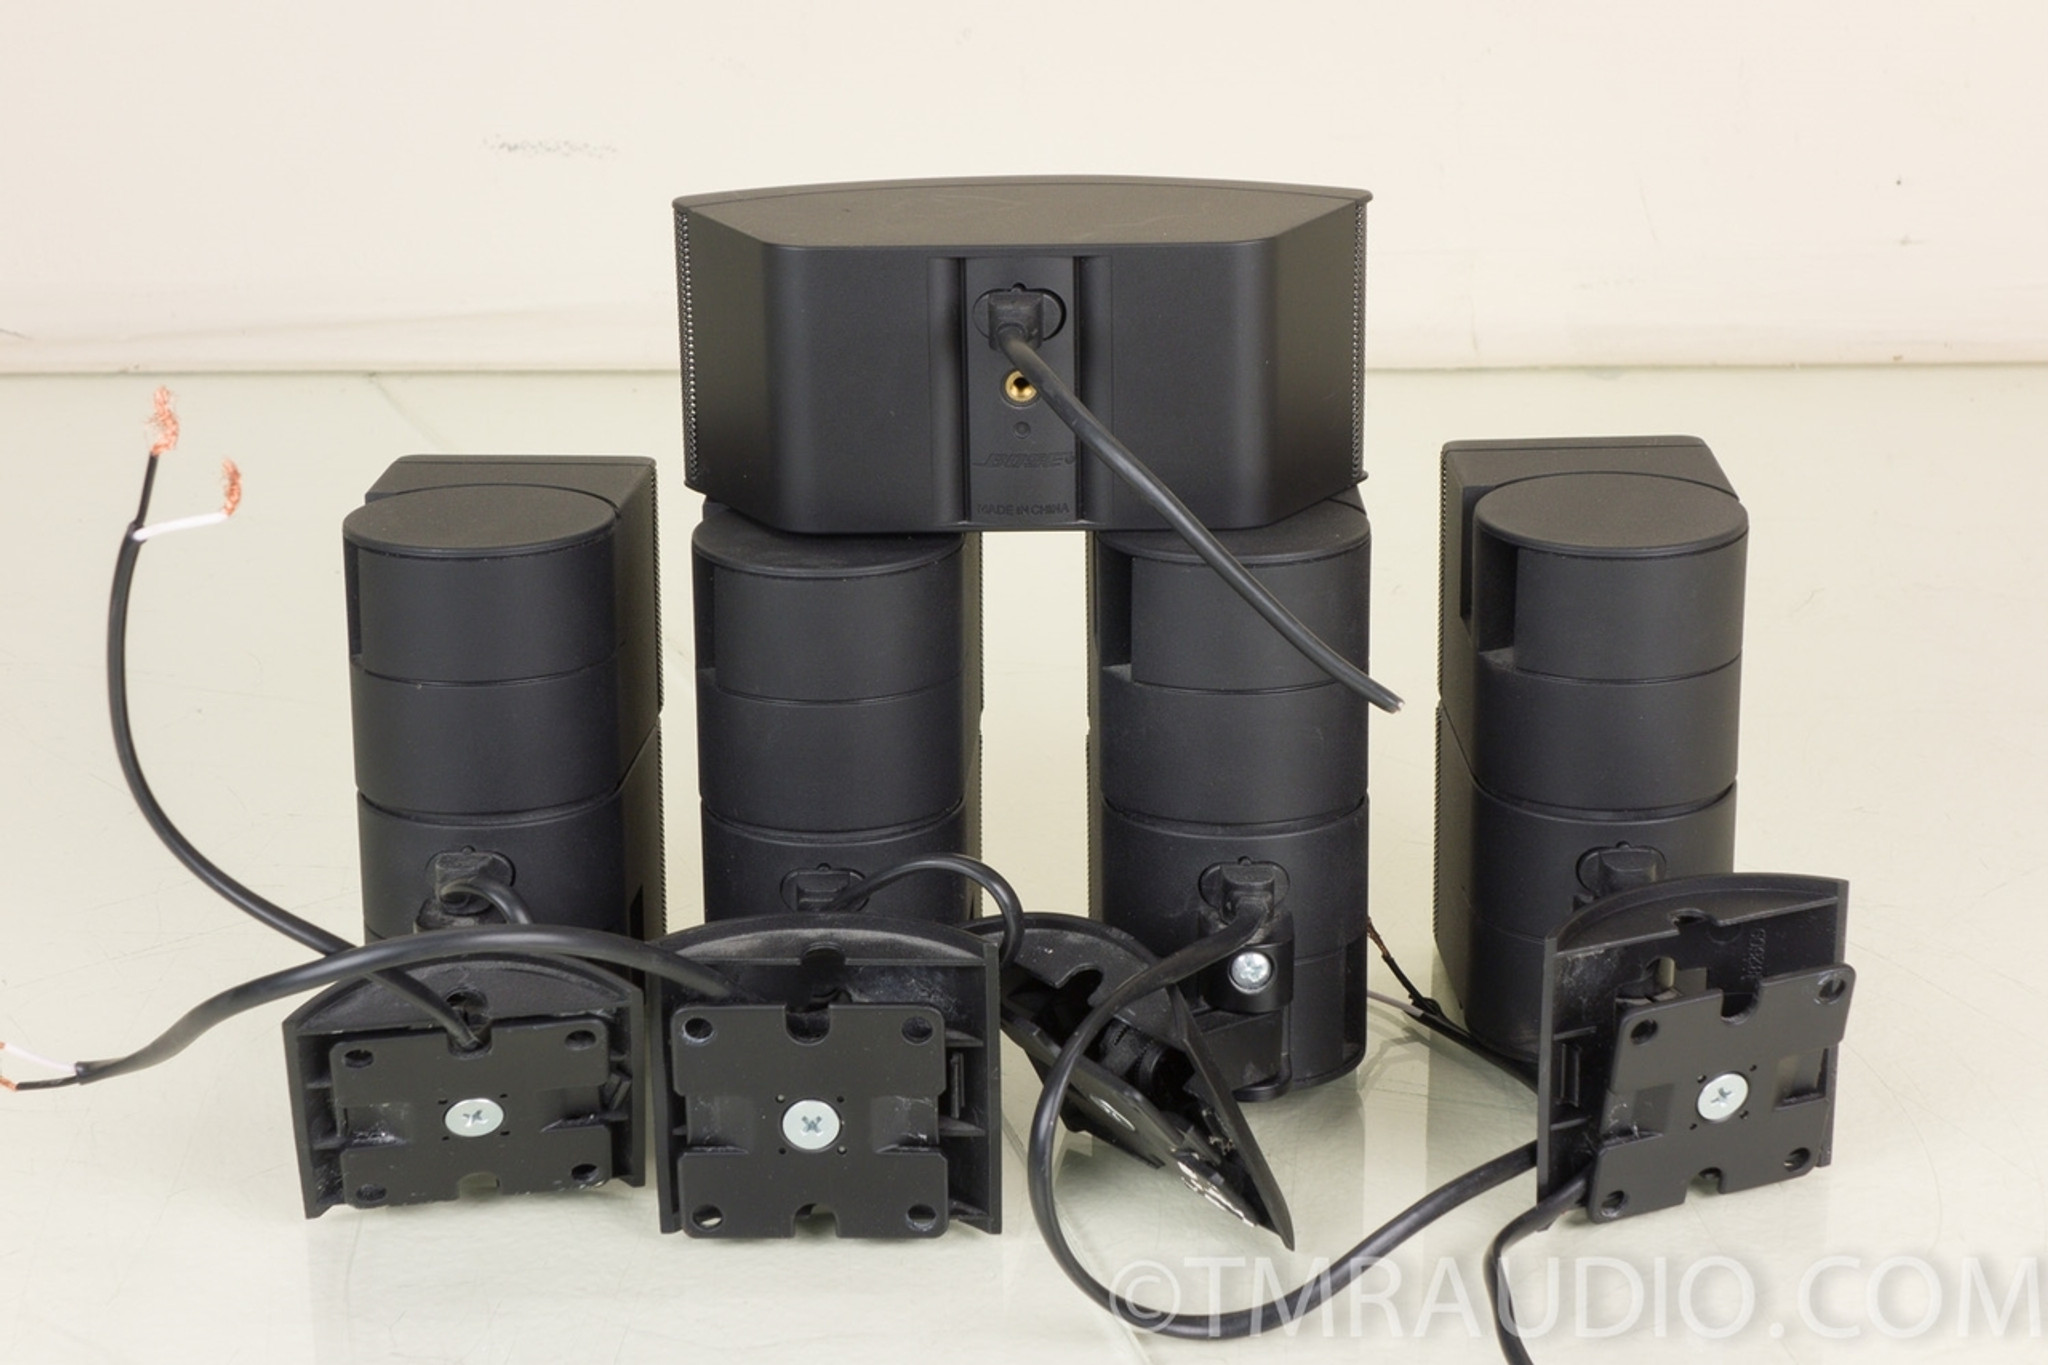 home theater wiring bose jewel wiring diagram home theater bose surround sound jewel cube speaker in wall wiring kit